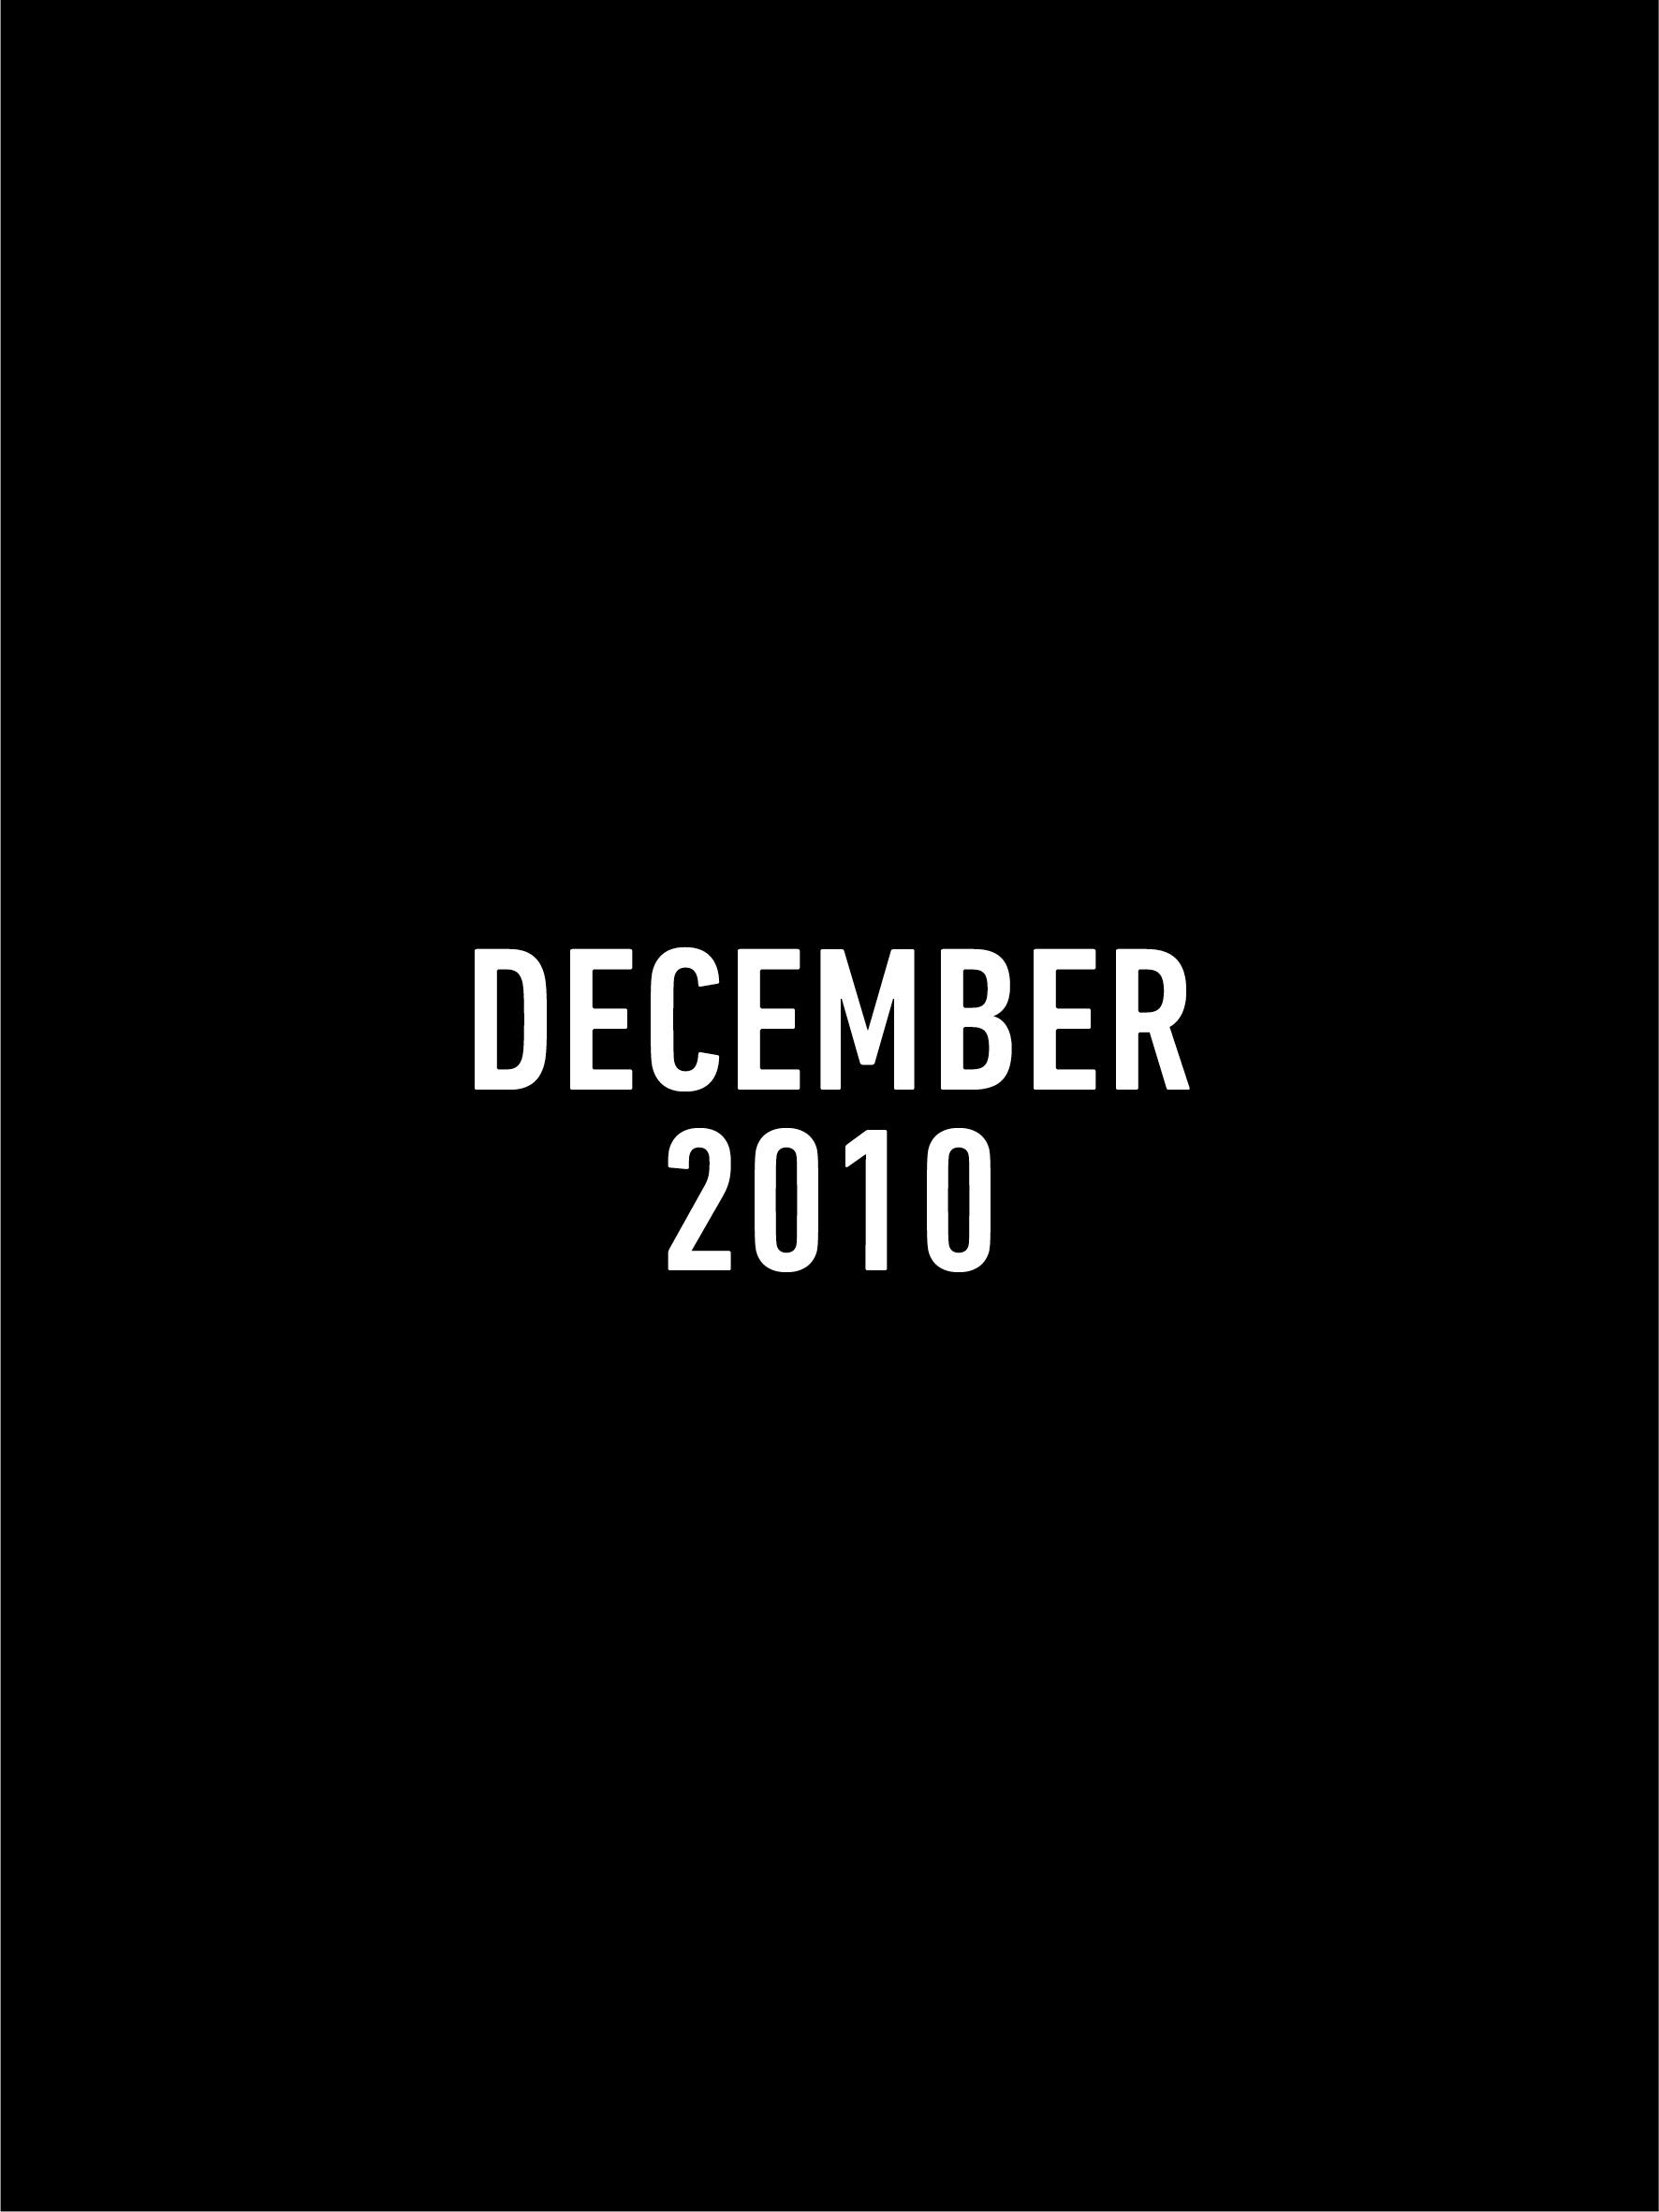 2010 monthly12.jpg